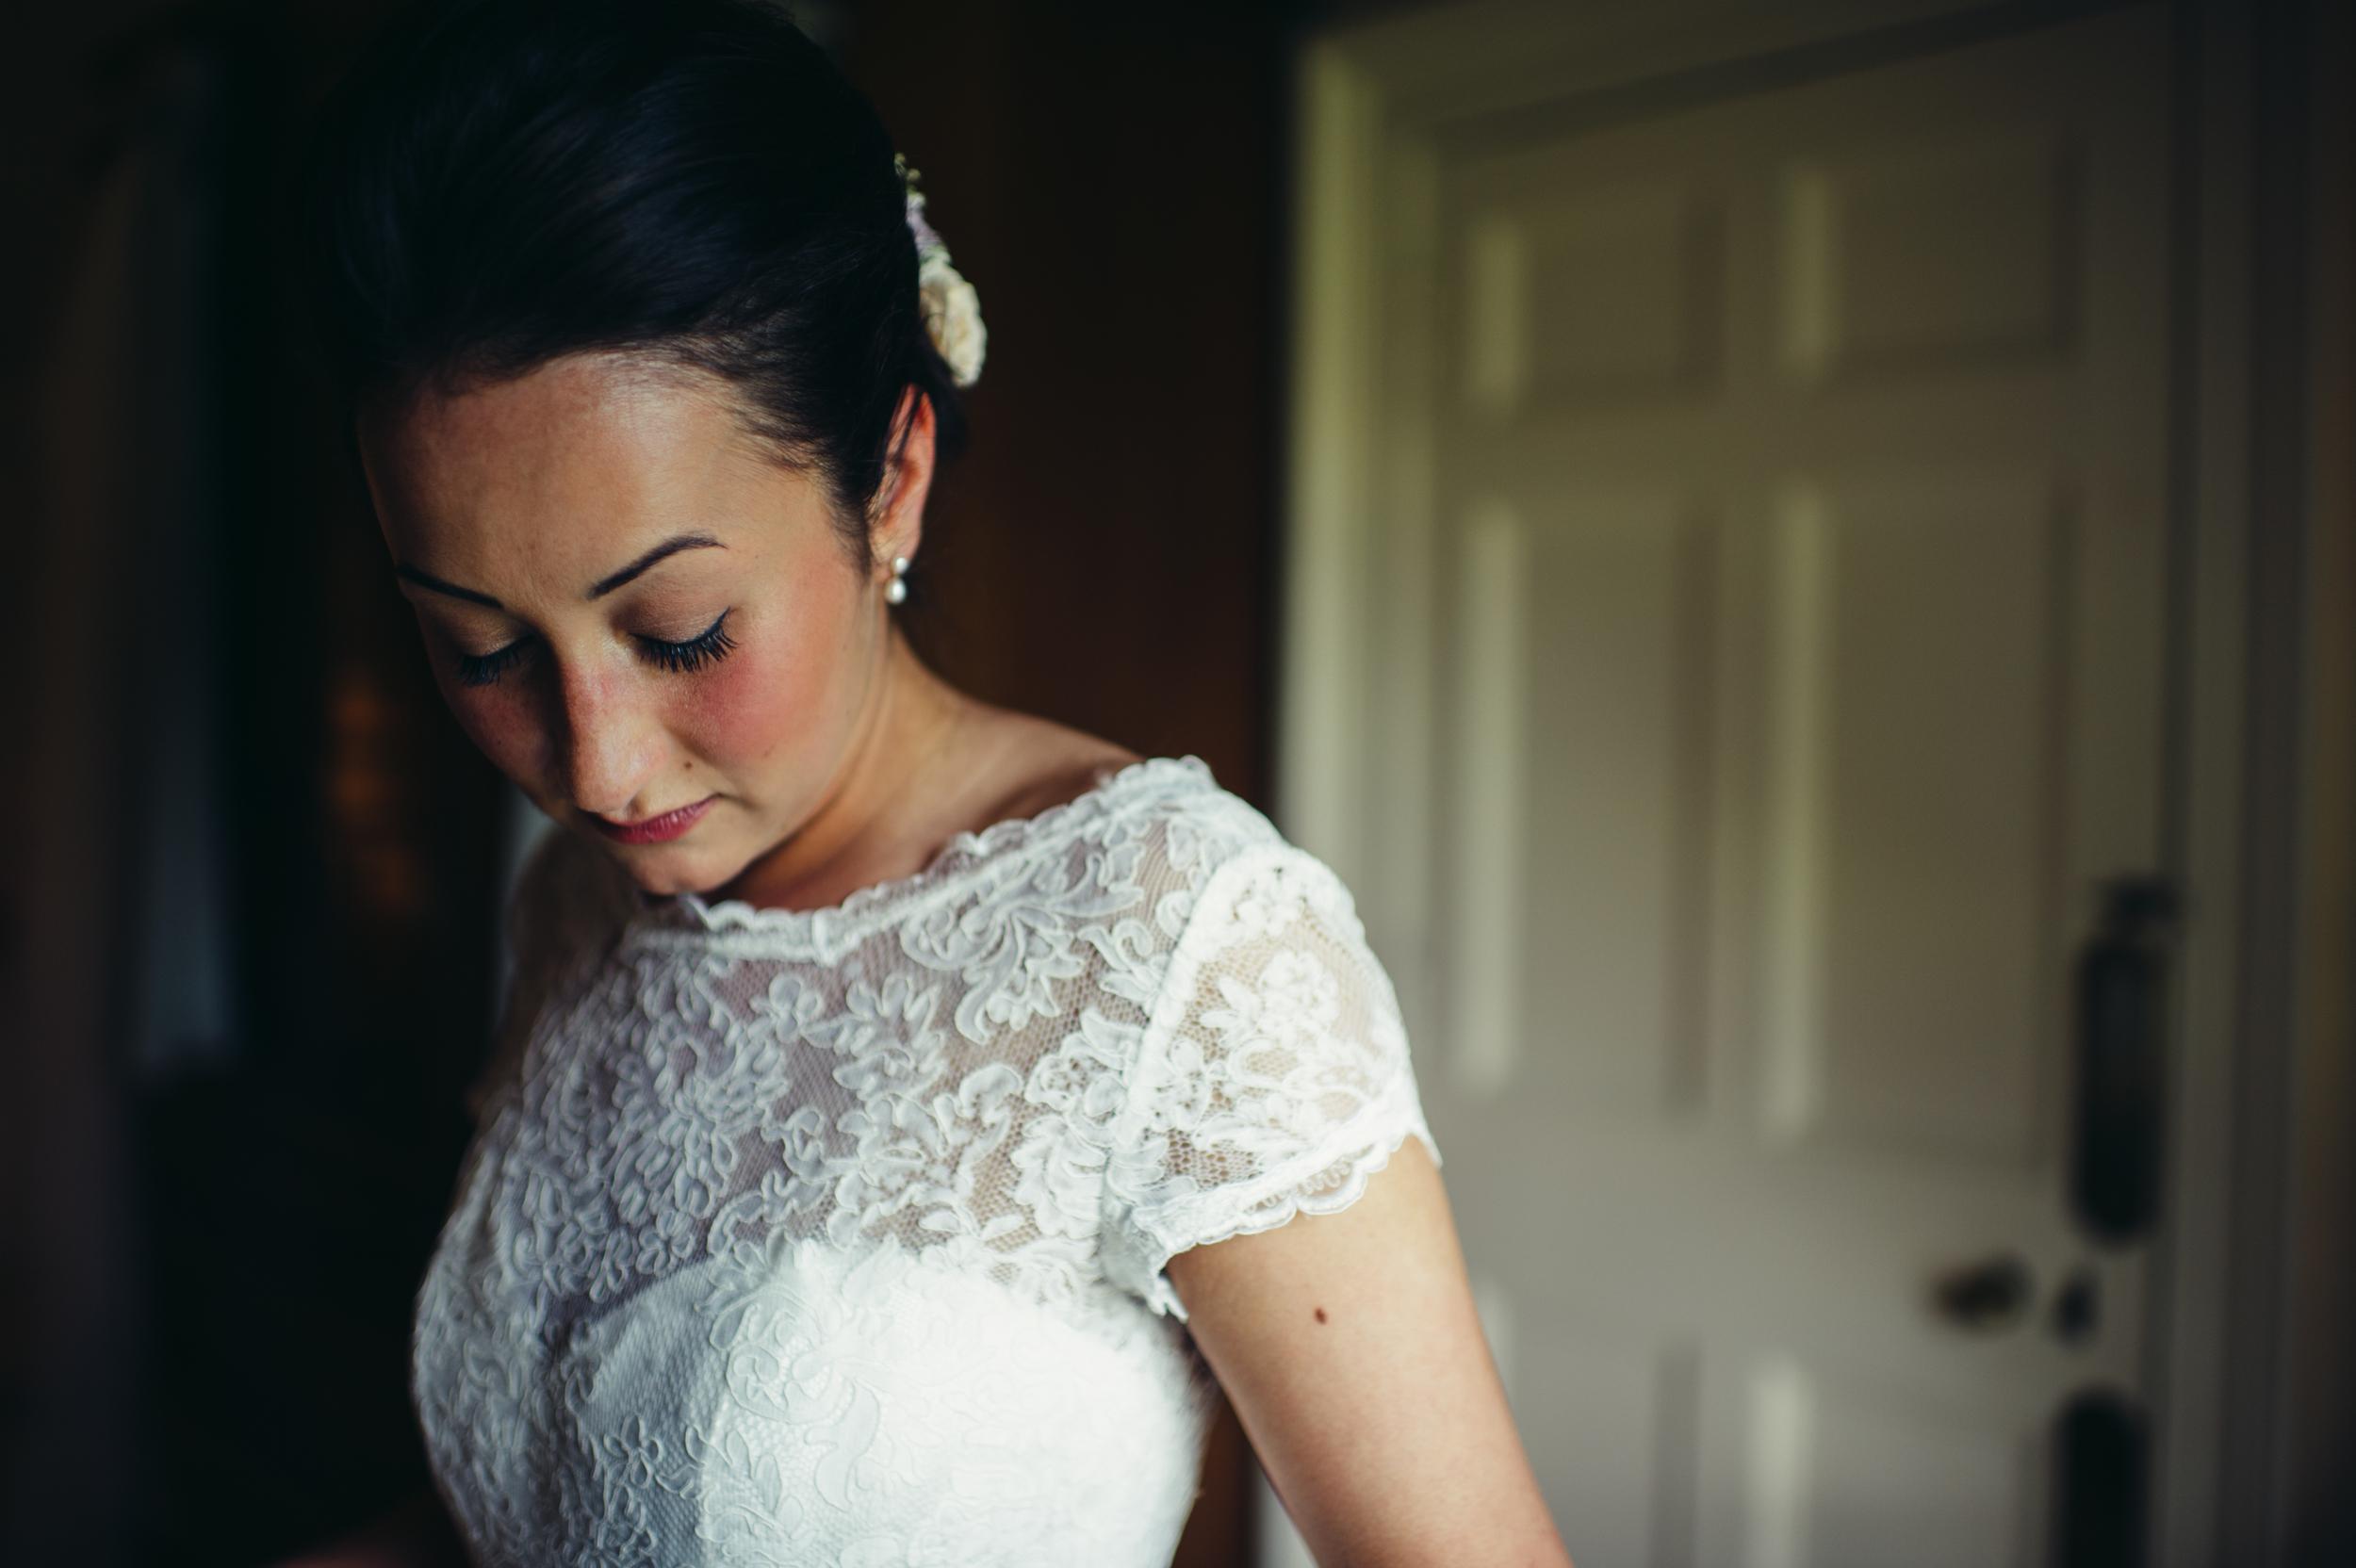 0069-lisa-devine-alternative-creative-wedding-photography-glasgow-edinburgh.JPG